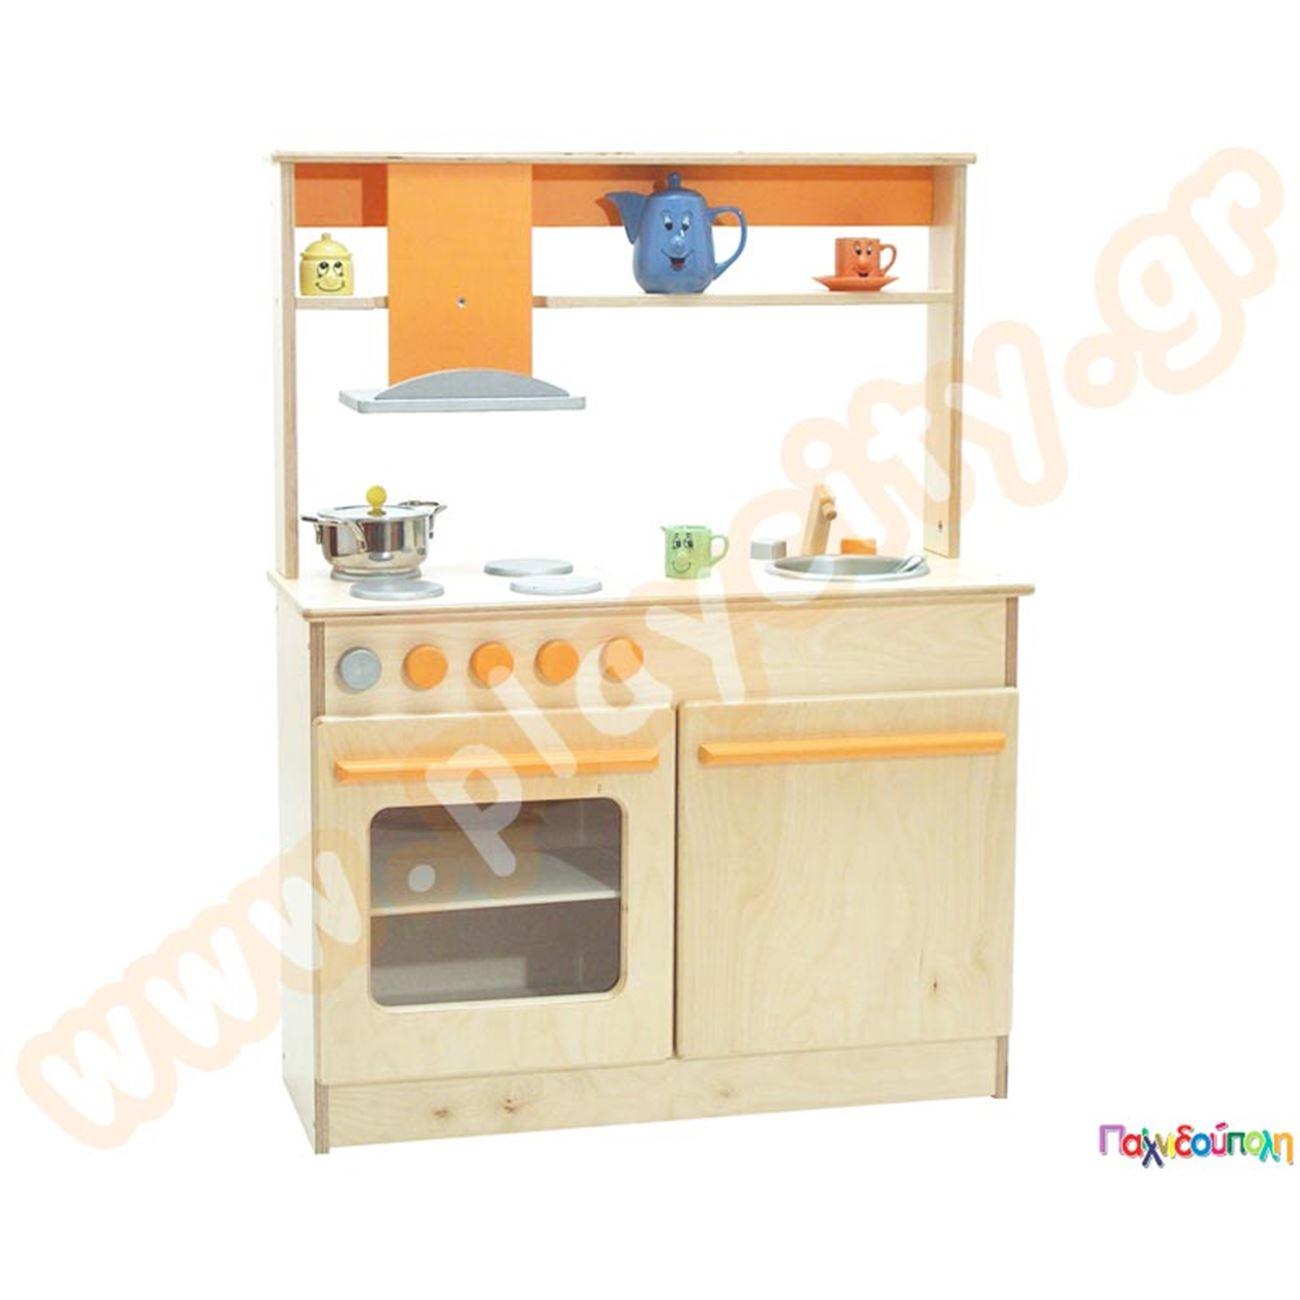 ed2c058218a7 Ξύλινα Έπιπλα Παιδικών Σταθμών και Νηπιαγωγείων Παιδική Κουζίνα ...